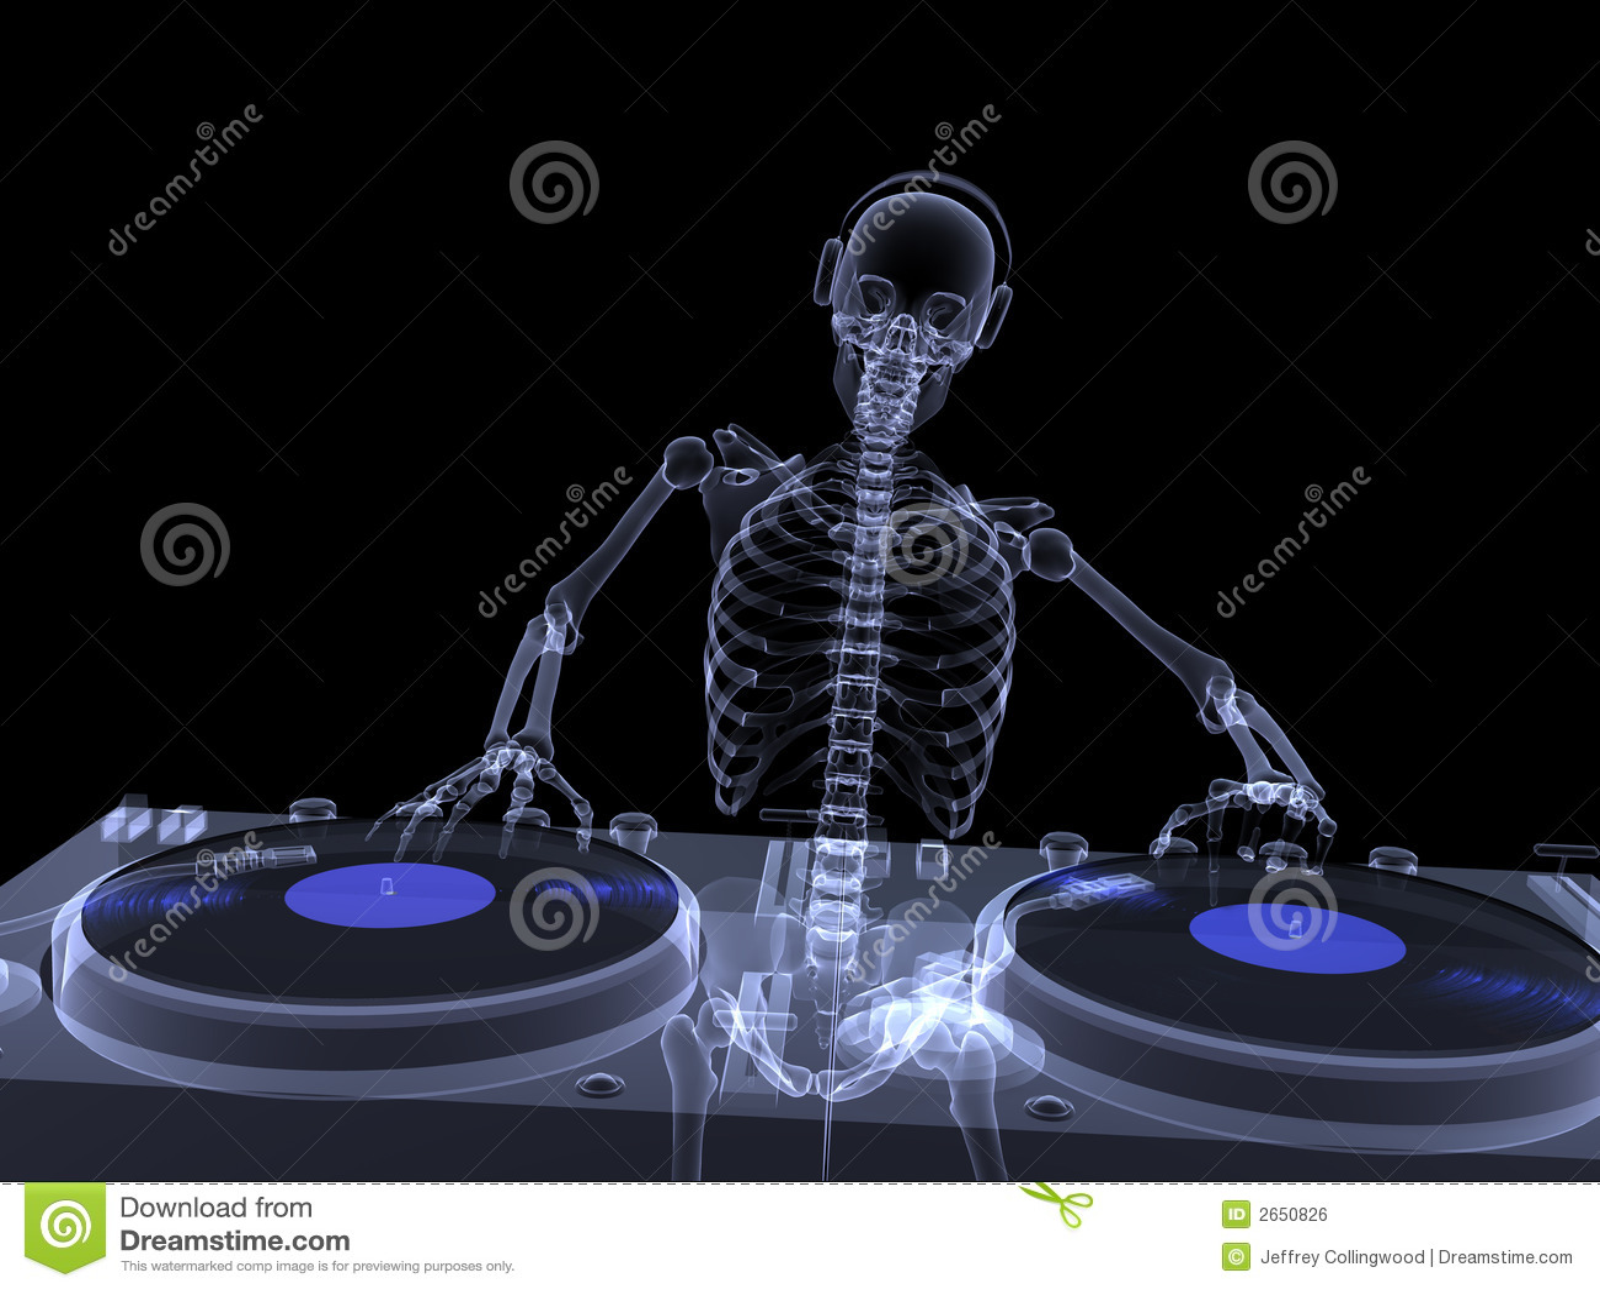 2 Master Suite House Plans Skeleton X Ray Dj 2 Royalty Free Stock Image Image